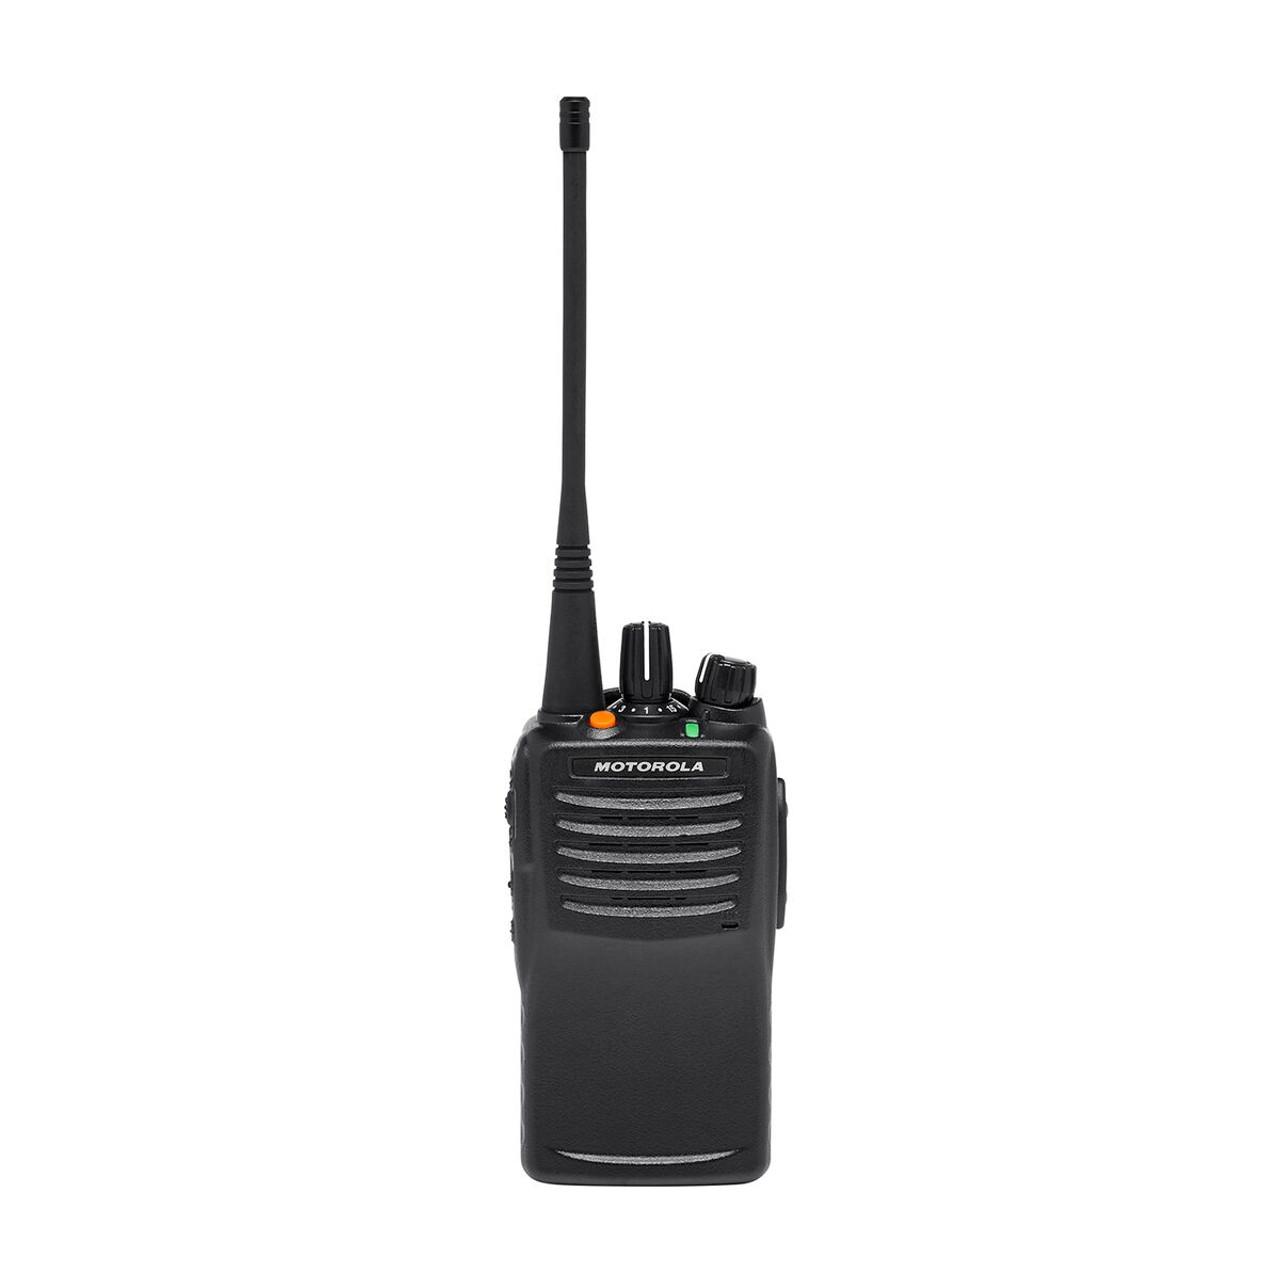 Motorola VX-451 5 Watt 32 Channel Two Way Radio